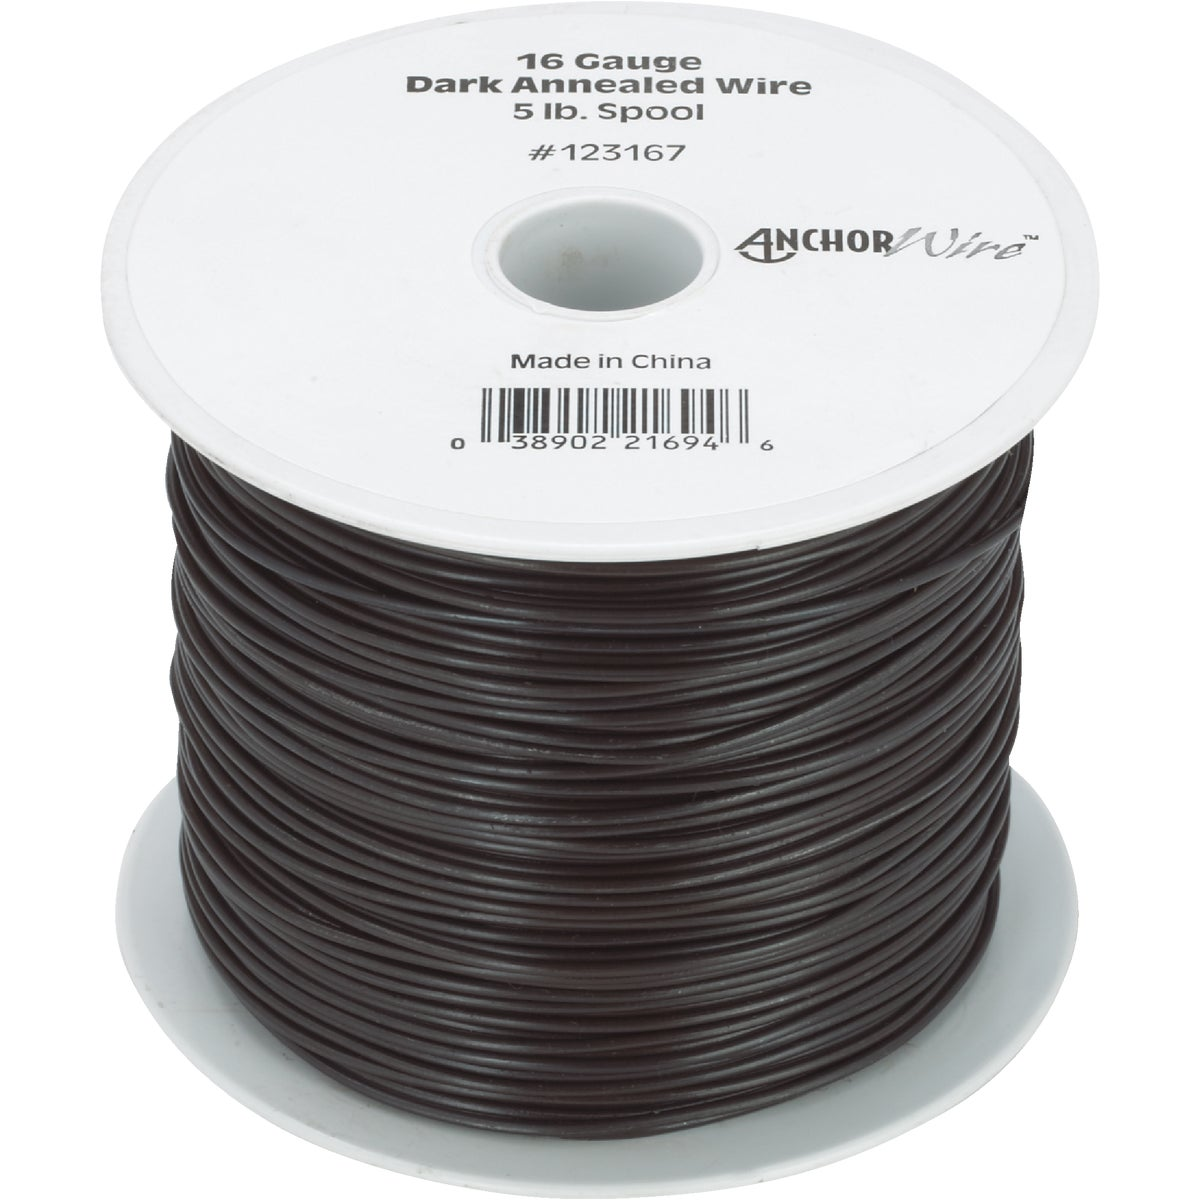 5LB 16G BLACK WIRE - 123167 by Hillman Fastener